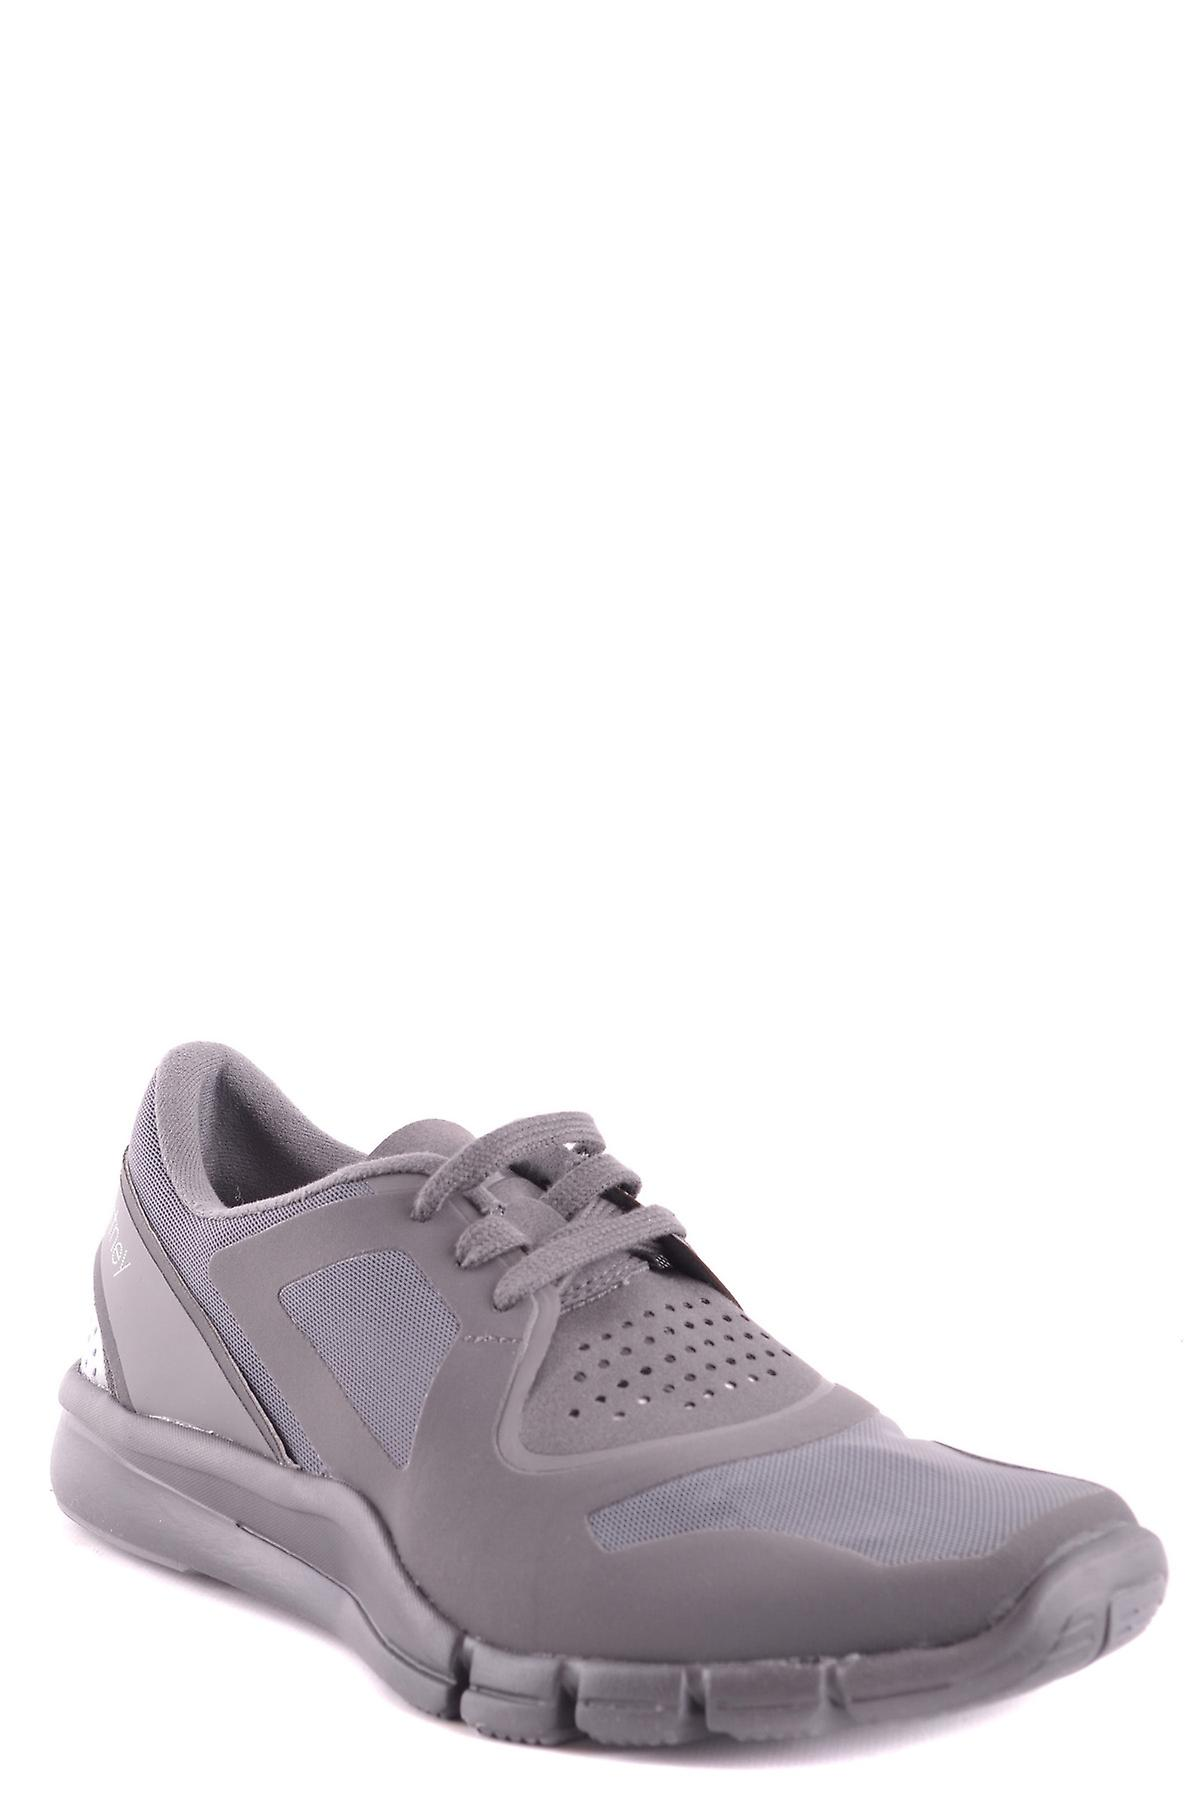 Adidas By Stella Mccartney Ezbc036001 Women's Grey Fabric Sneakers